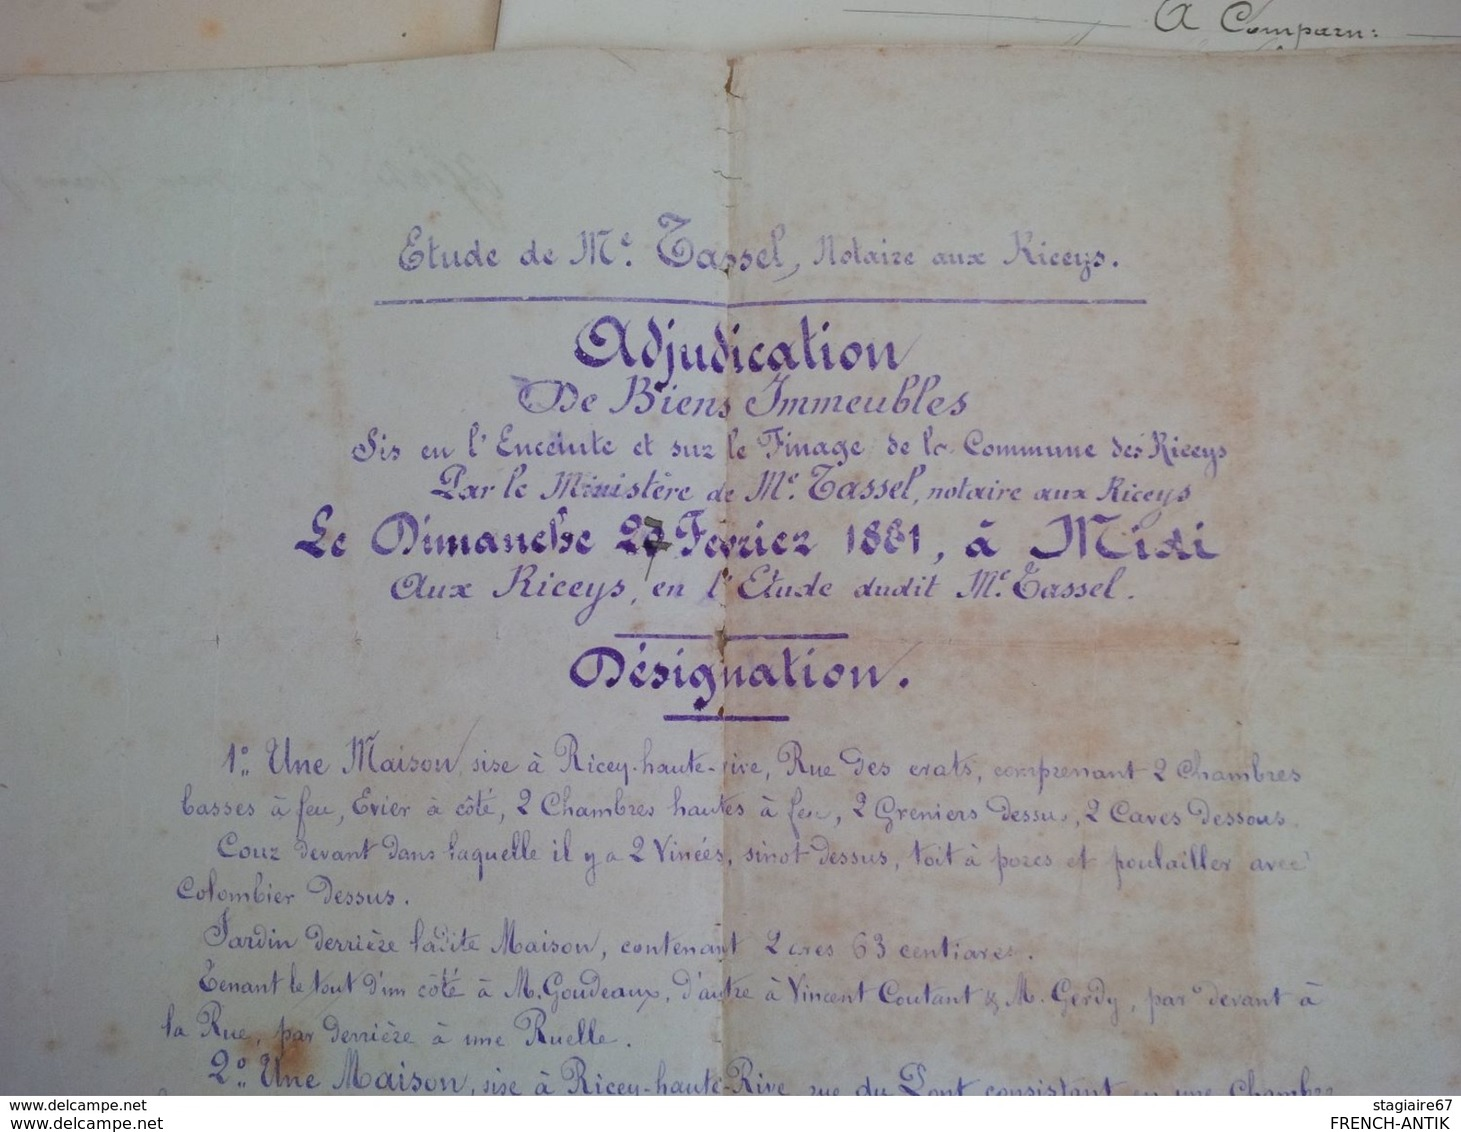 LES RICEYS AUBE ADJUDICATION MAISON FAMILLE GERARD TRANCHANT ADJUGE A EMILE FARINET MILLOT VIGNERON AUX RICEYS 1881 - Old Paper